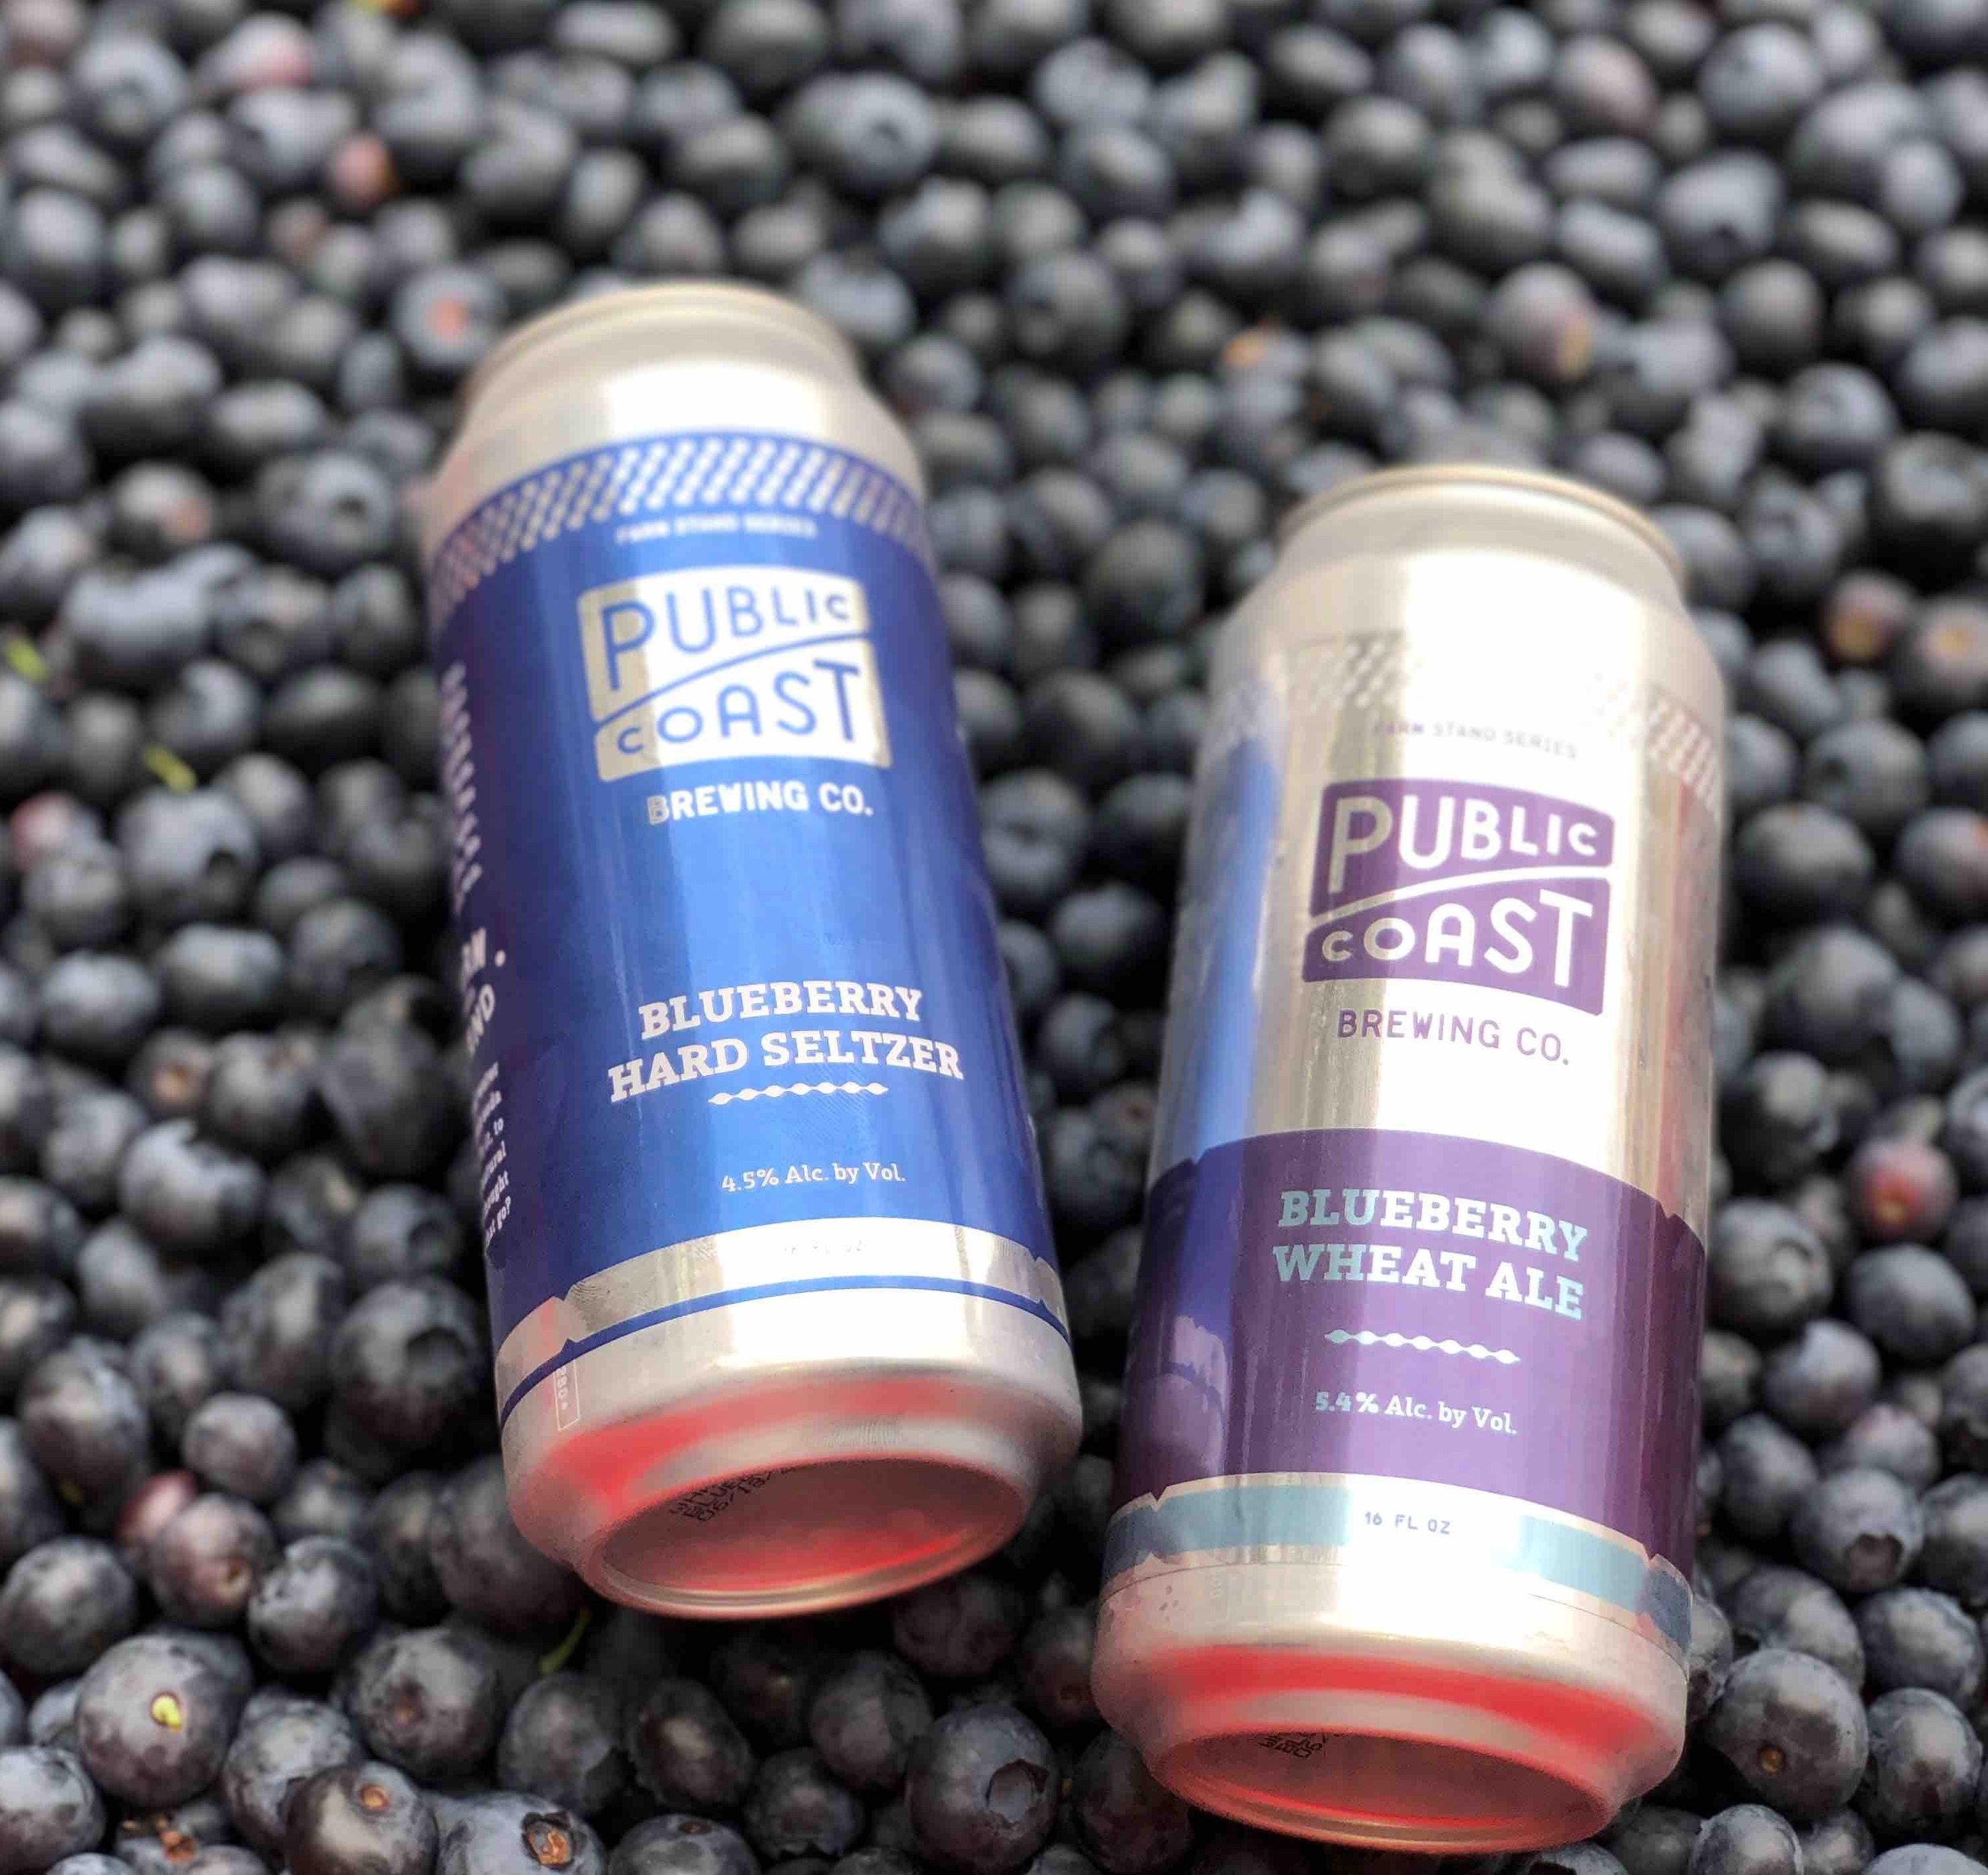 image of Blueberry Hard Seltzer and Blueberry Wheat Ale courtesy of Public Coast Brewing